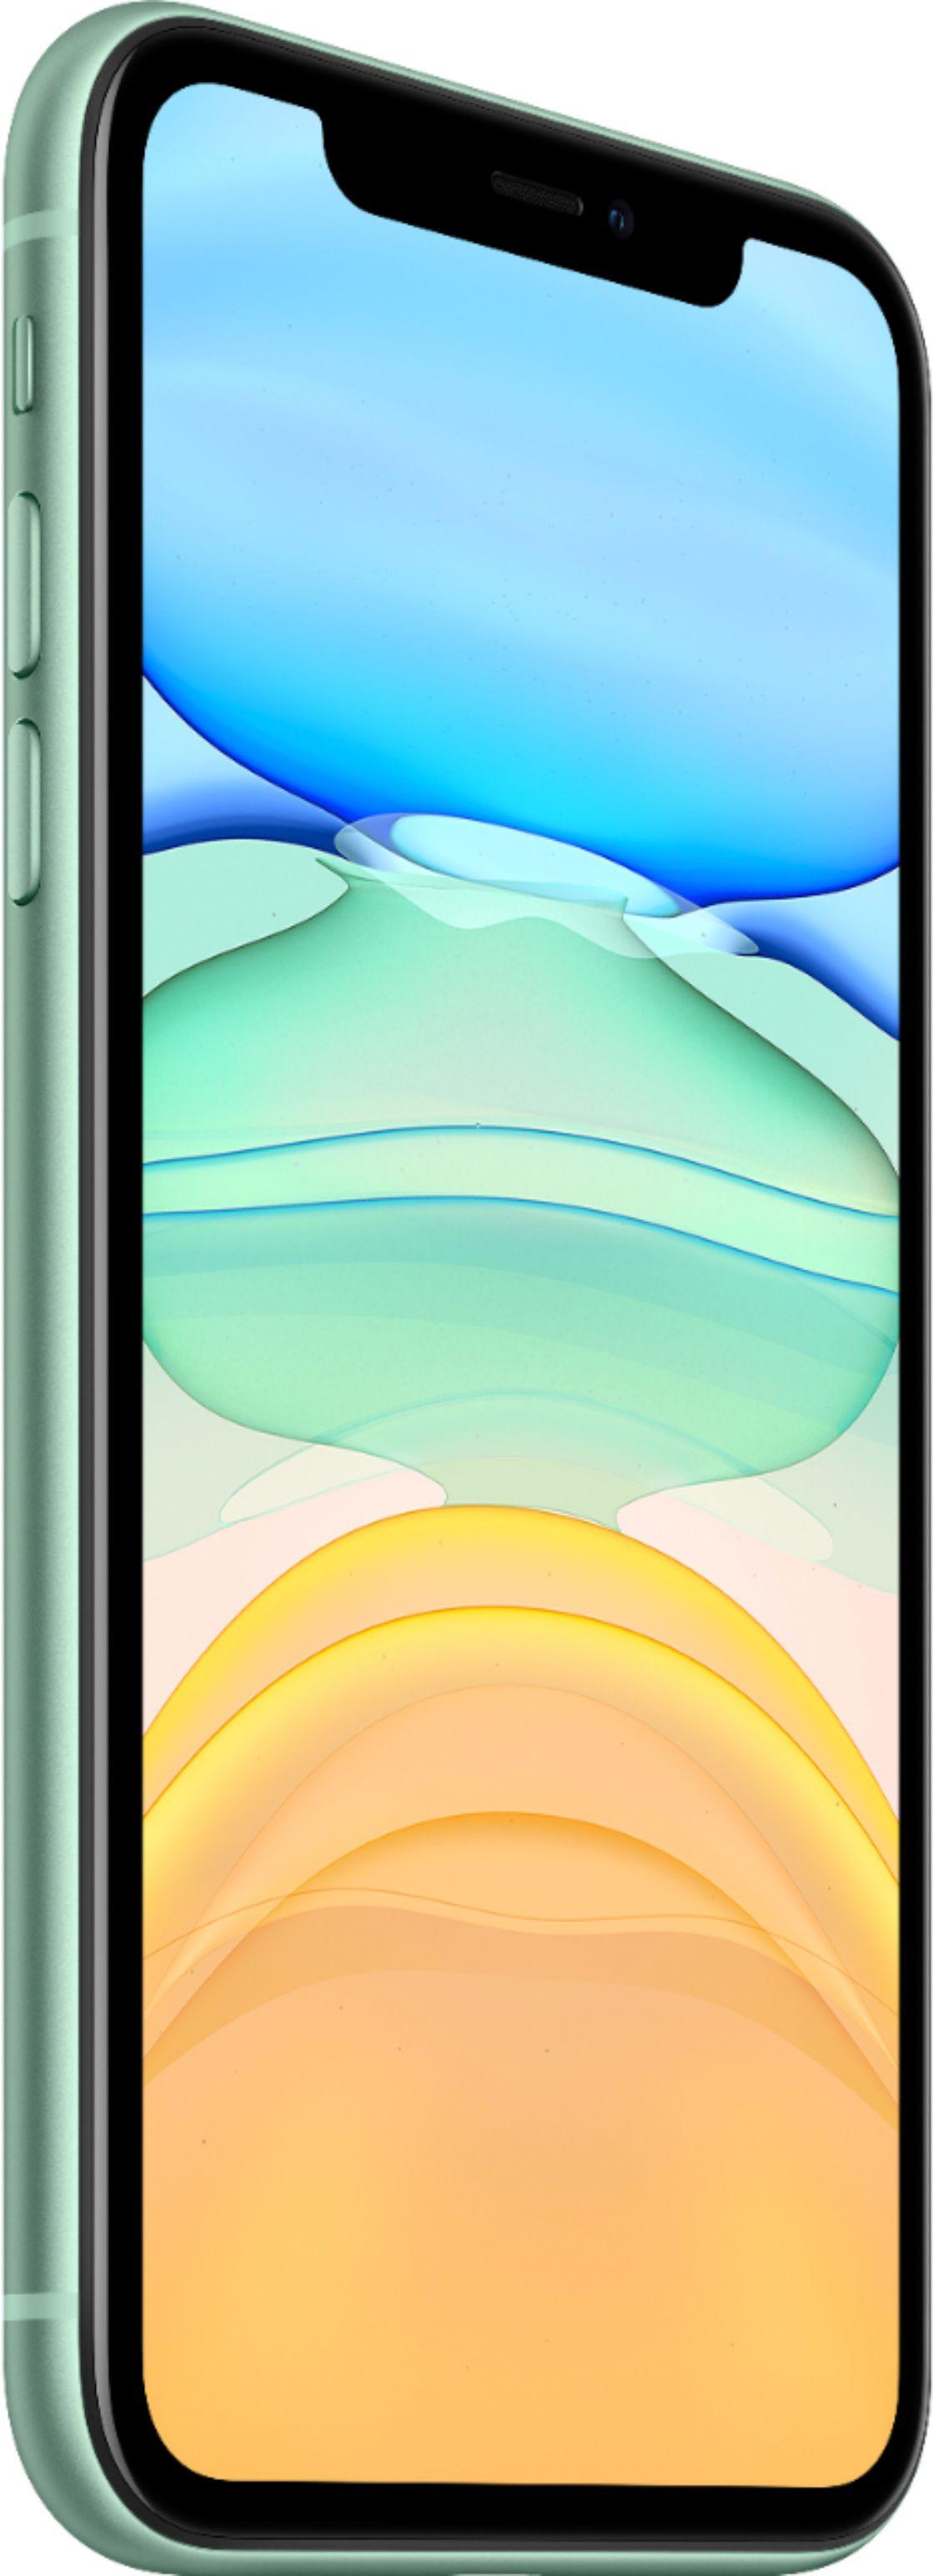 thumbnail 7 - Apple iPhone 11 64GB Factory Unlocked 4G LTE Smartphone